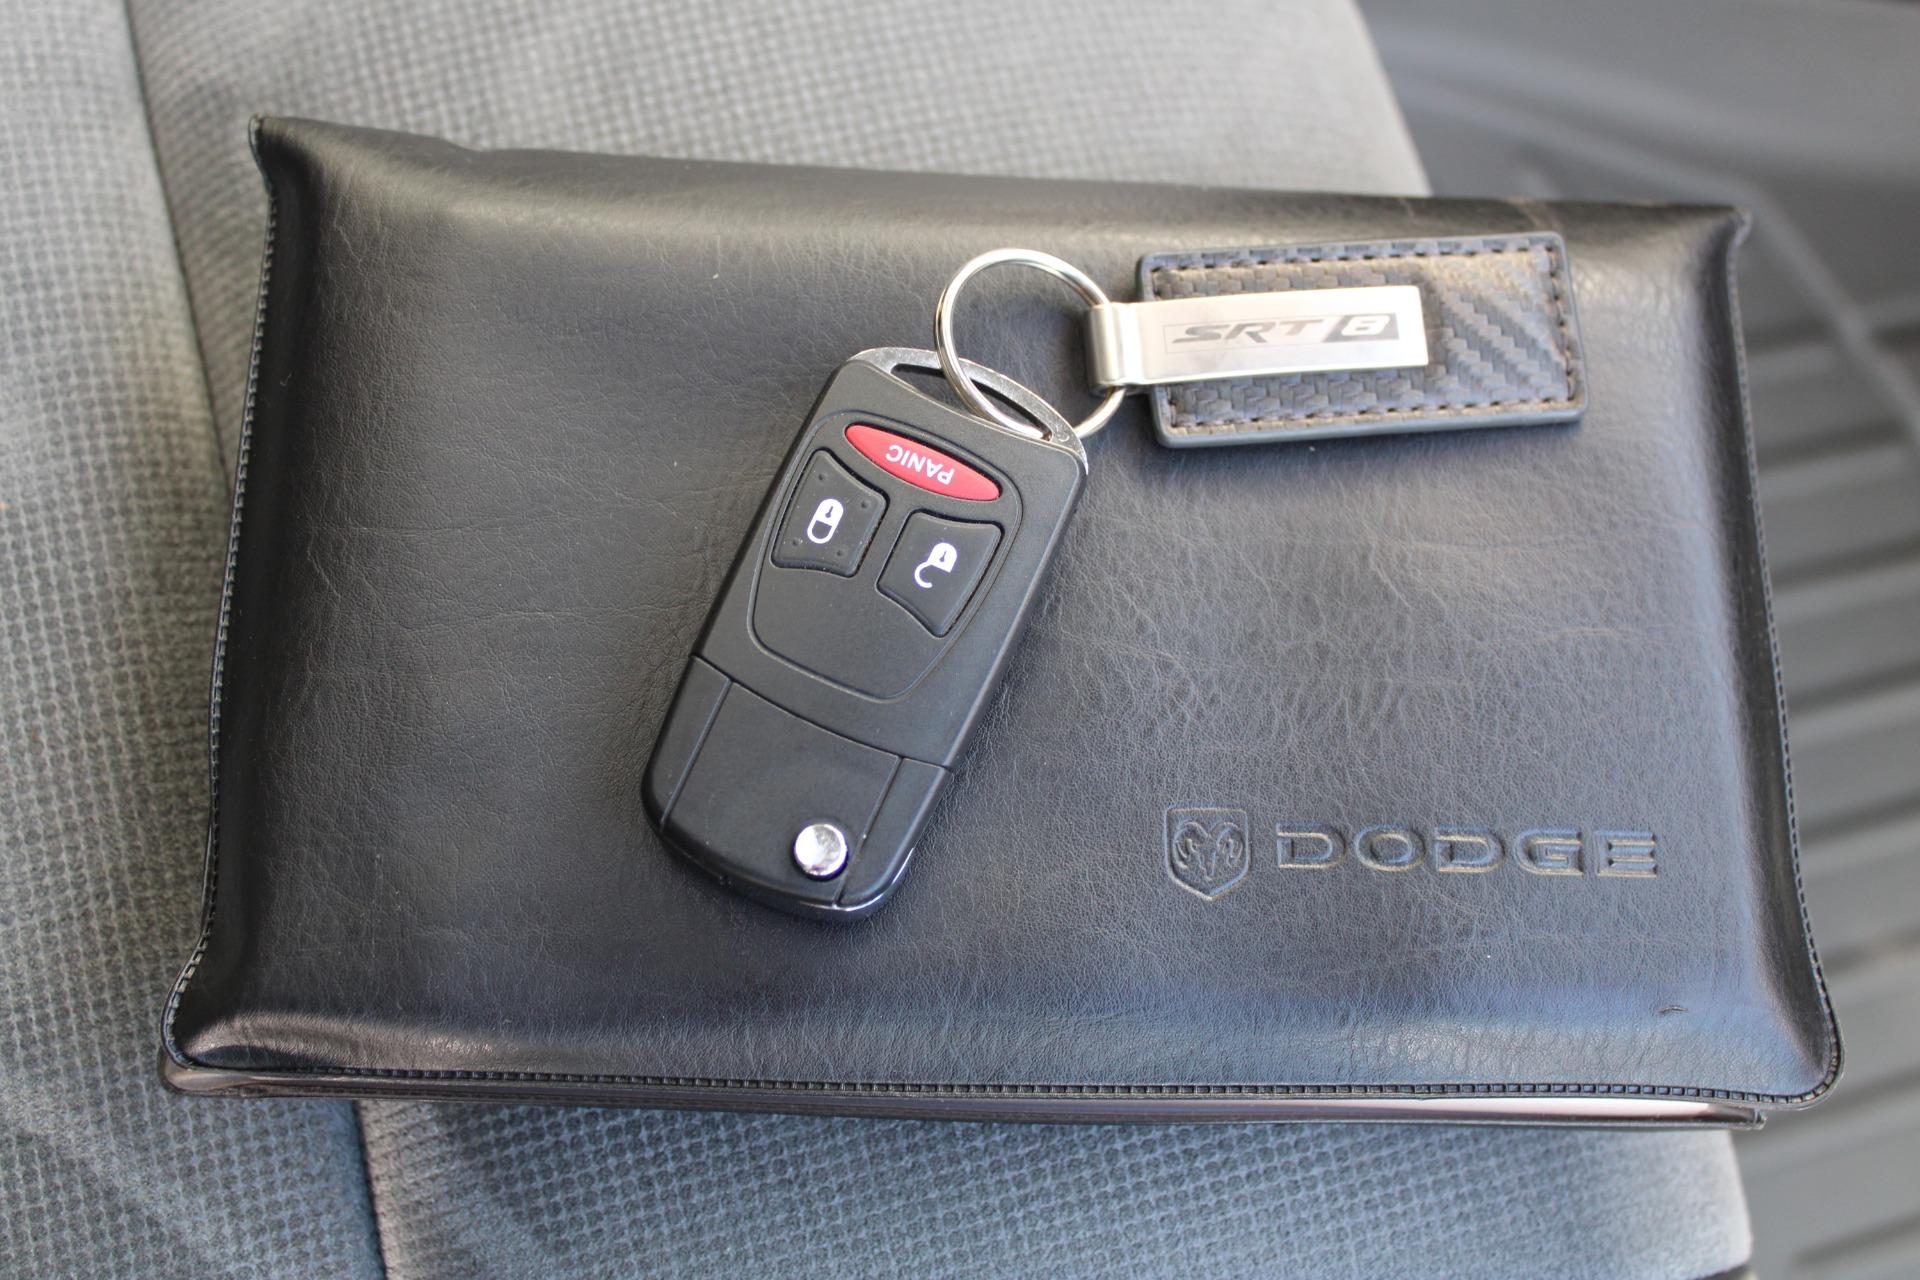 Used-2006-Dodge-Magnum-SRT8-Chevelle